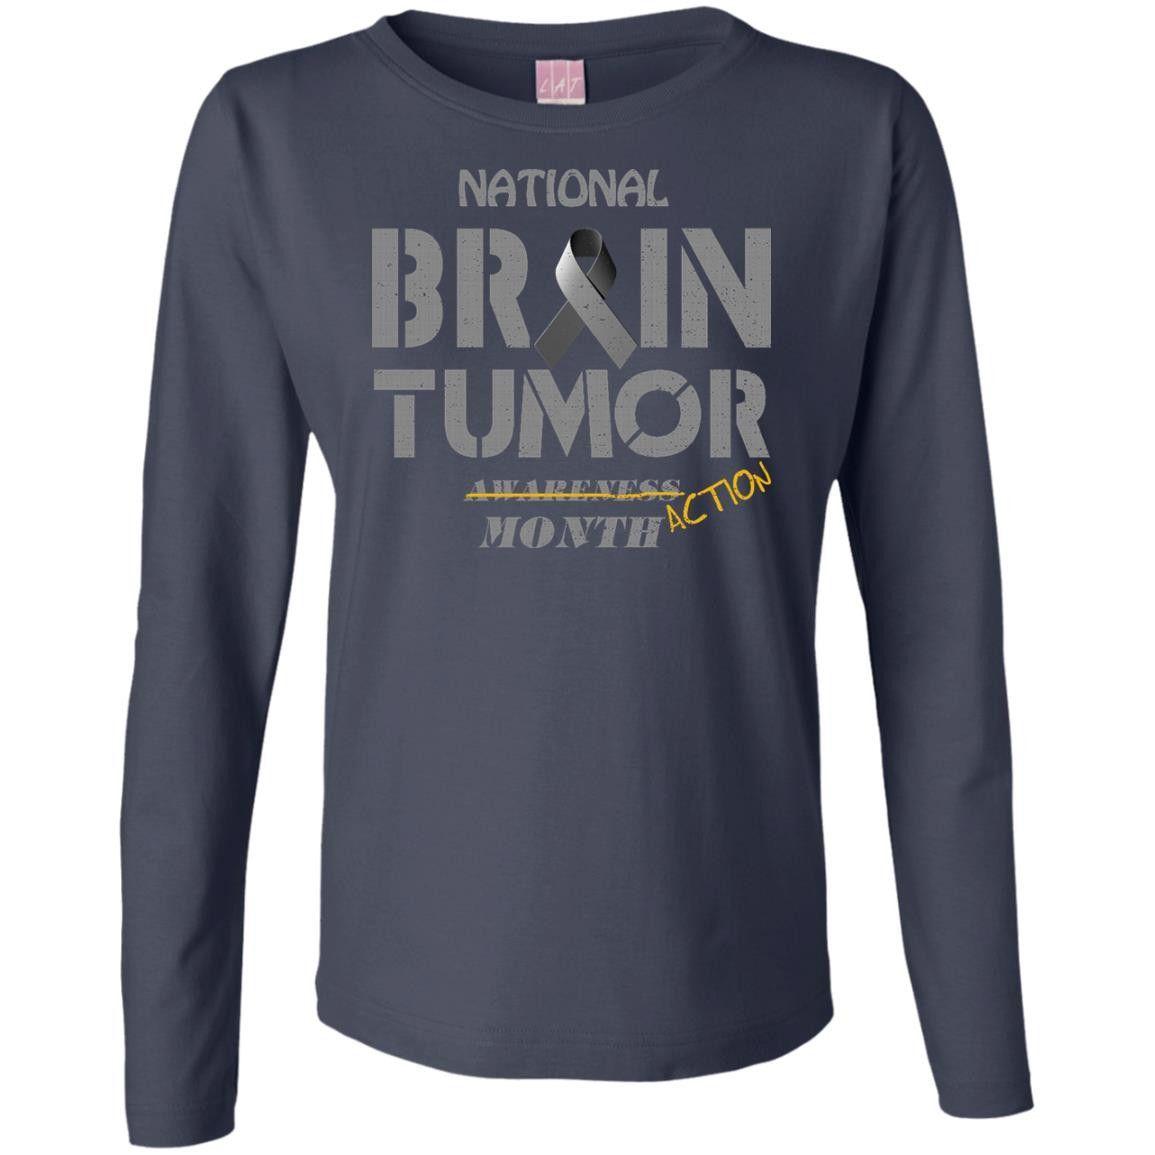 National brain tumor awareness action month Ladies' Long Sleeve Cotton TShirt